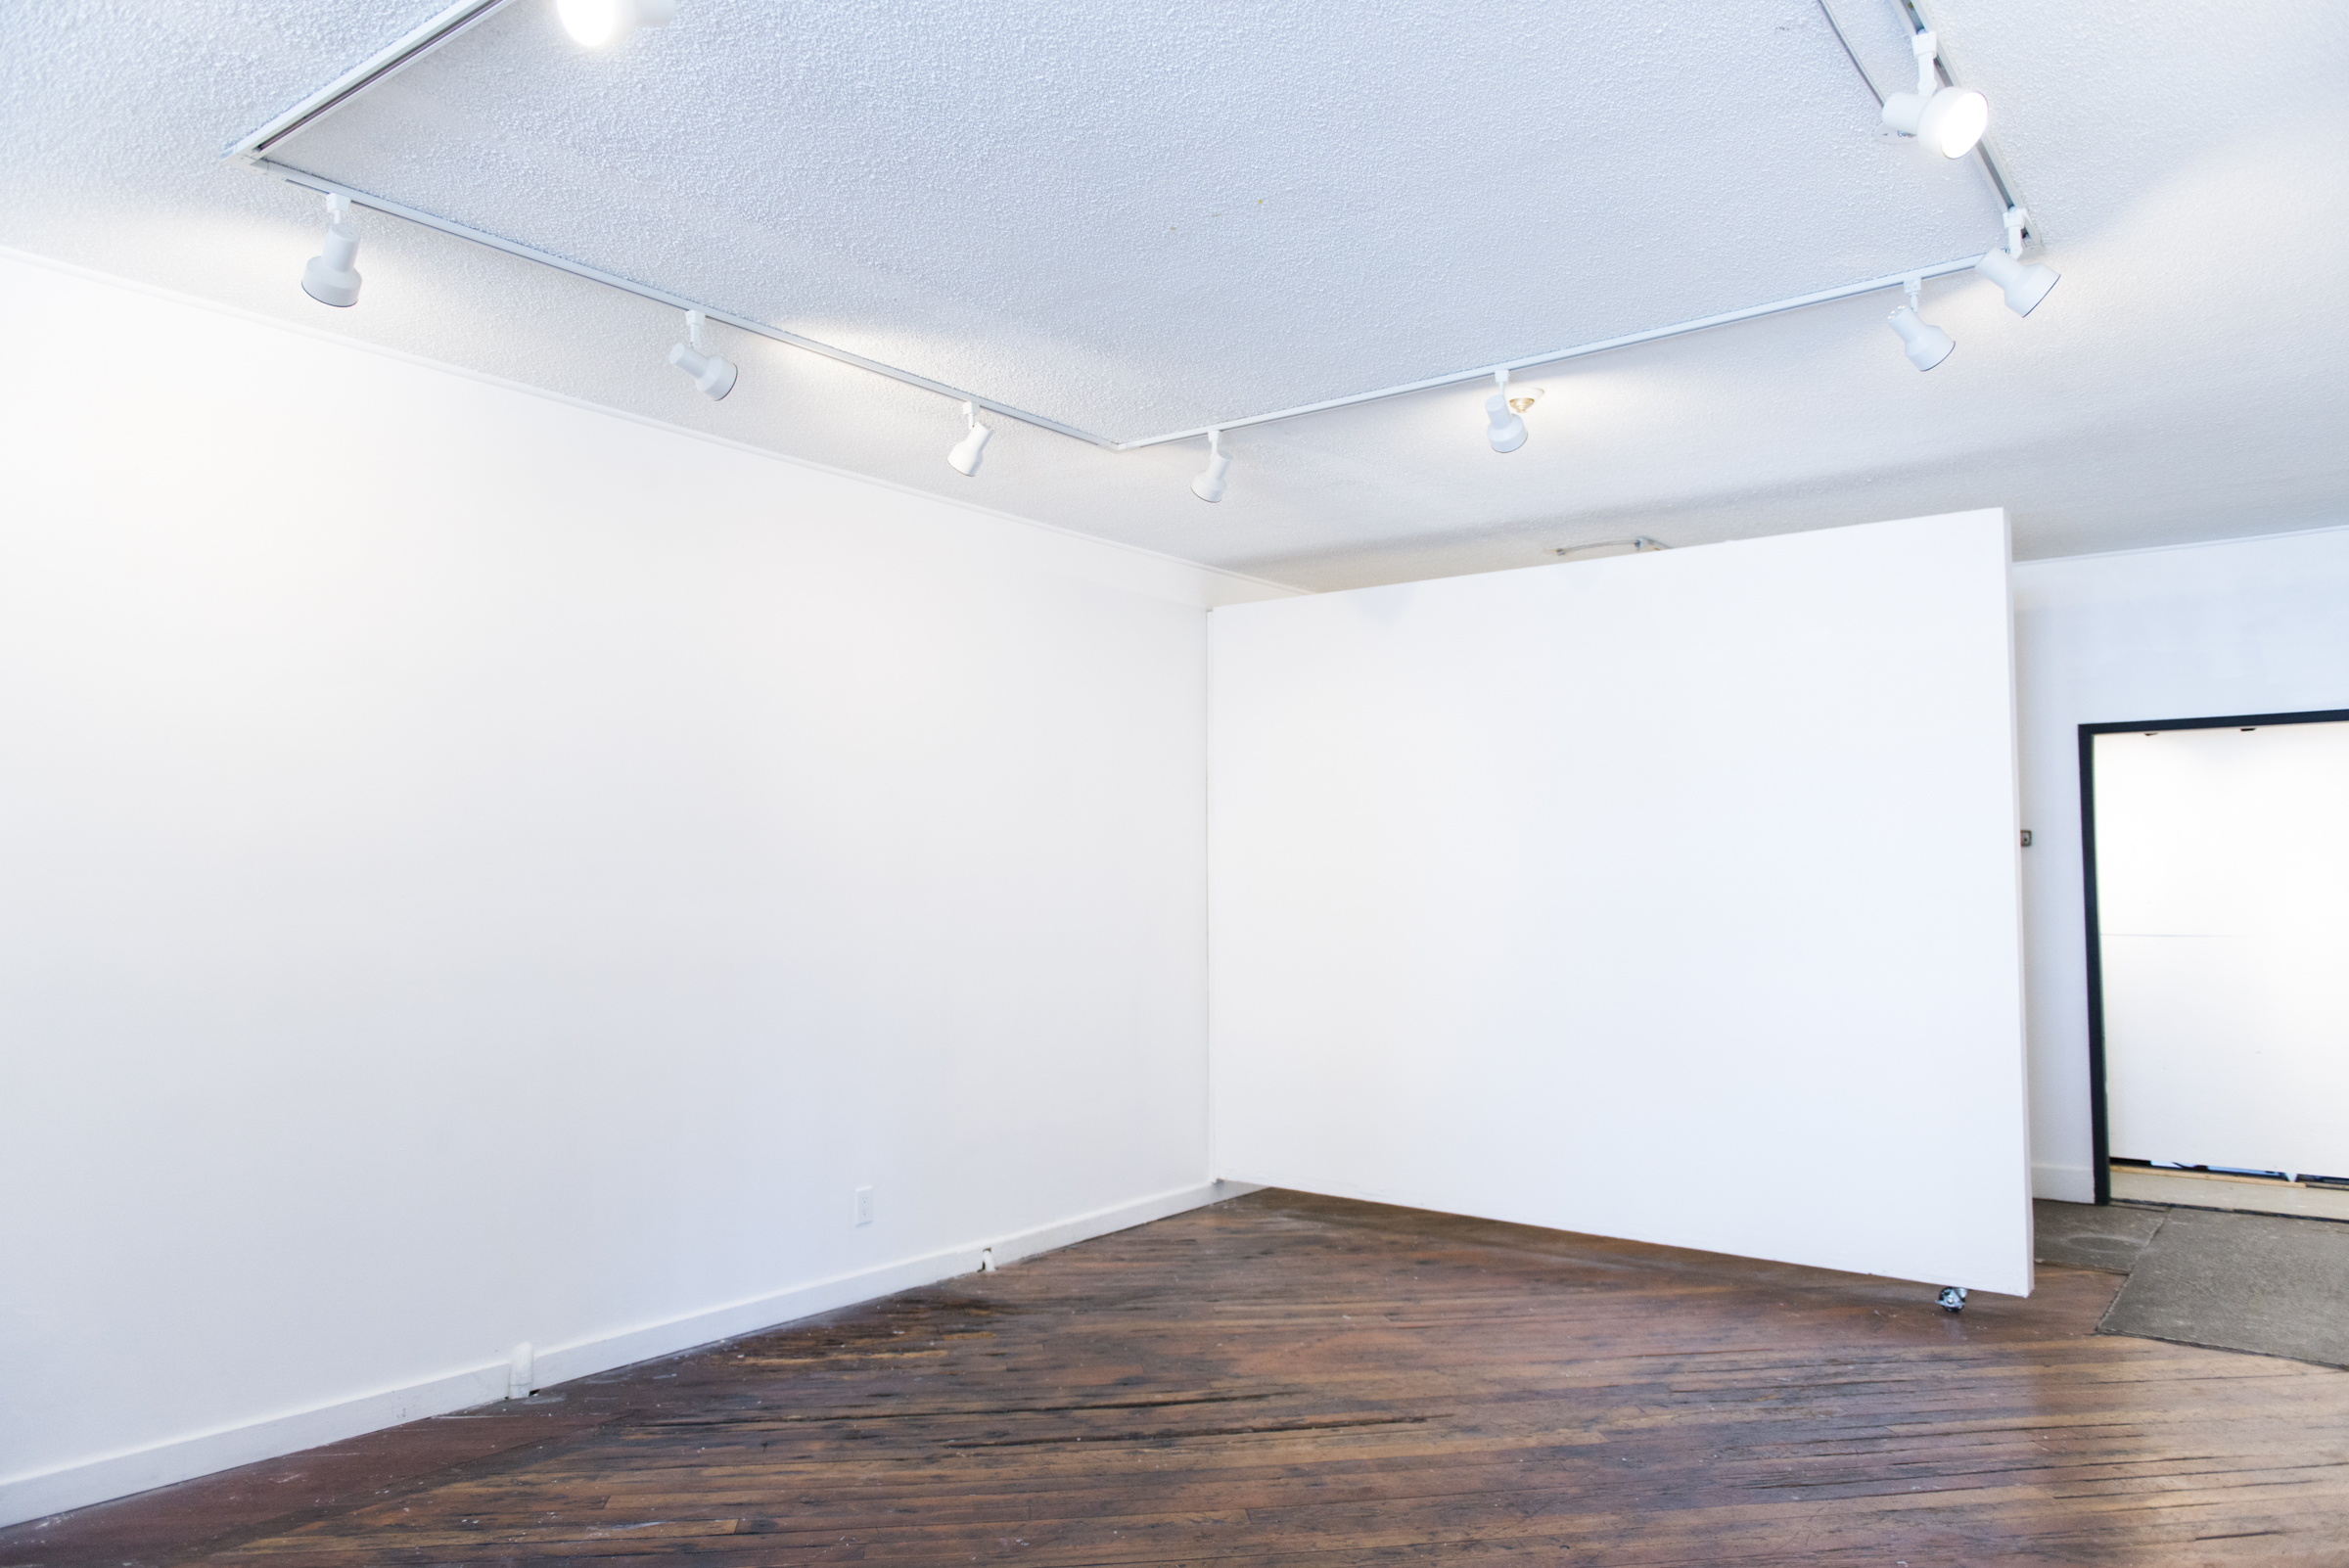 Untitled interior 6554